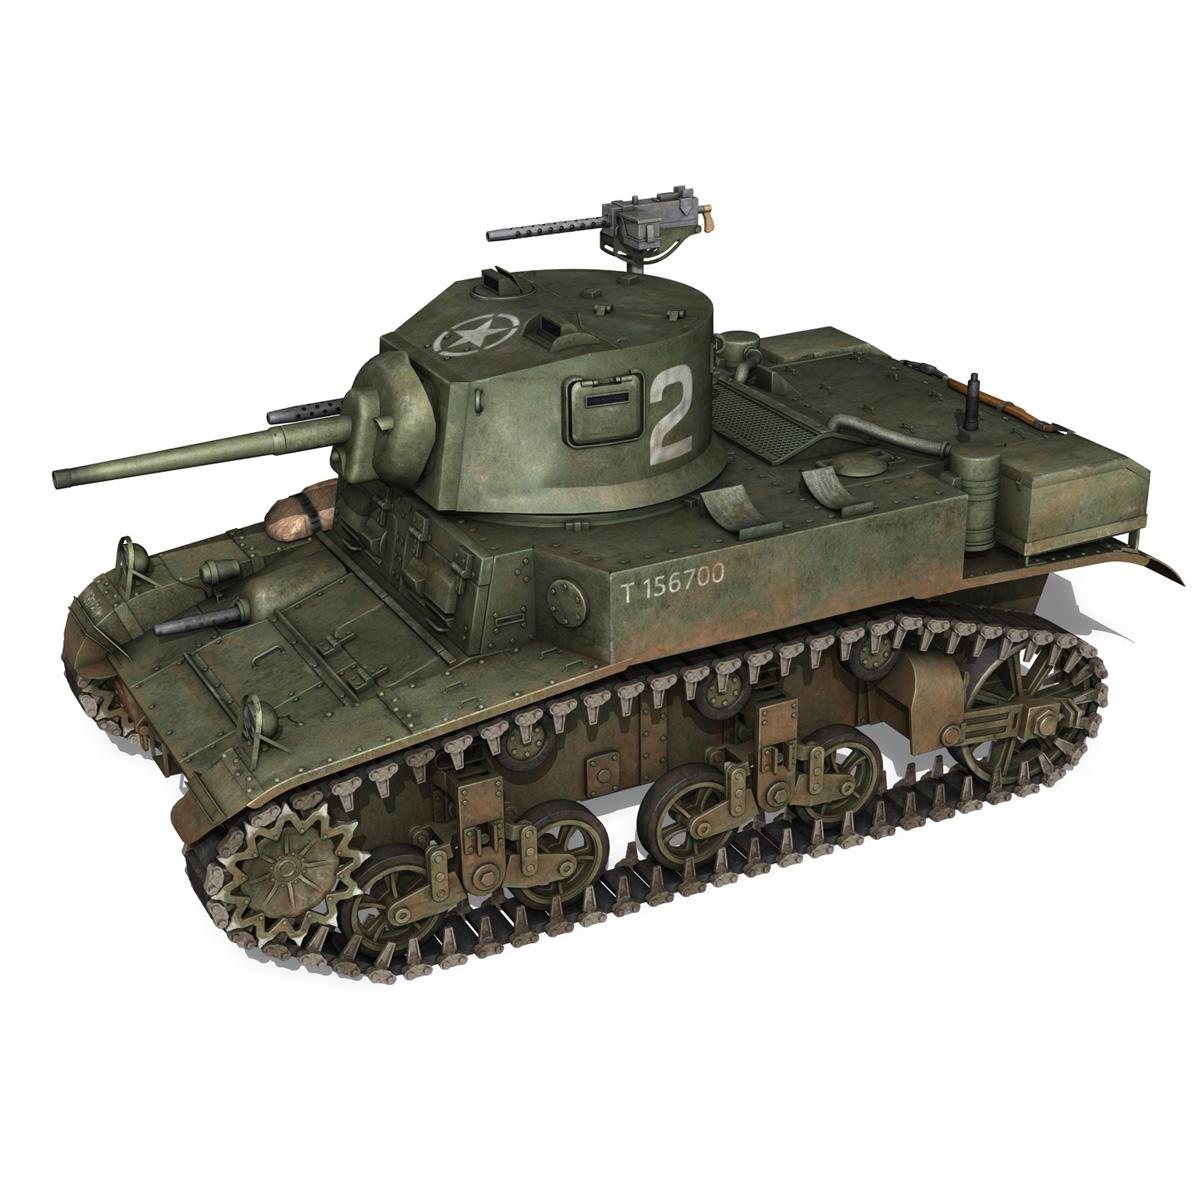 m3a1 light tank stuart – 156700 3d model c4d fbx lwo lw lws obj 3ds 265338